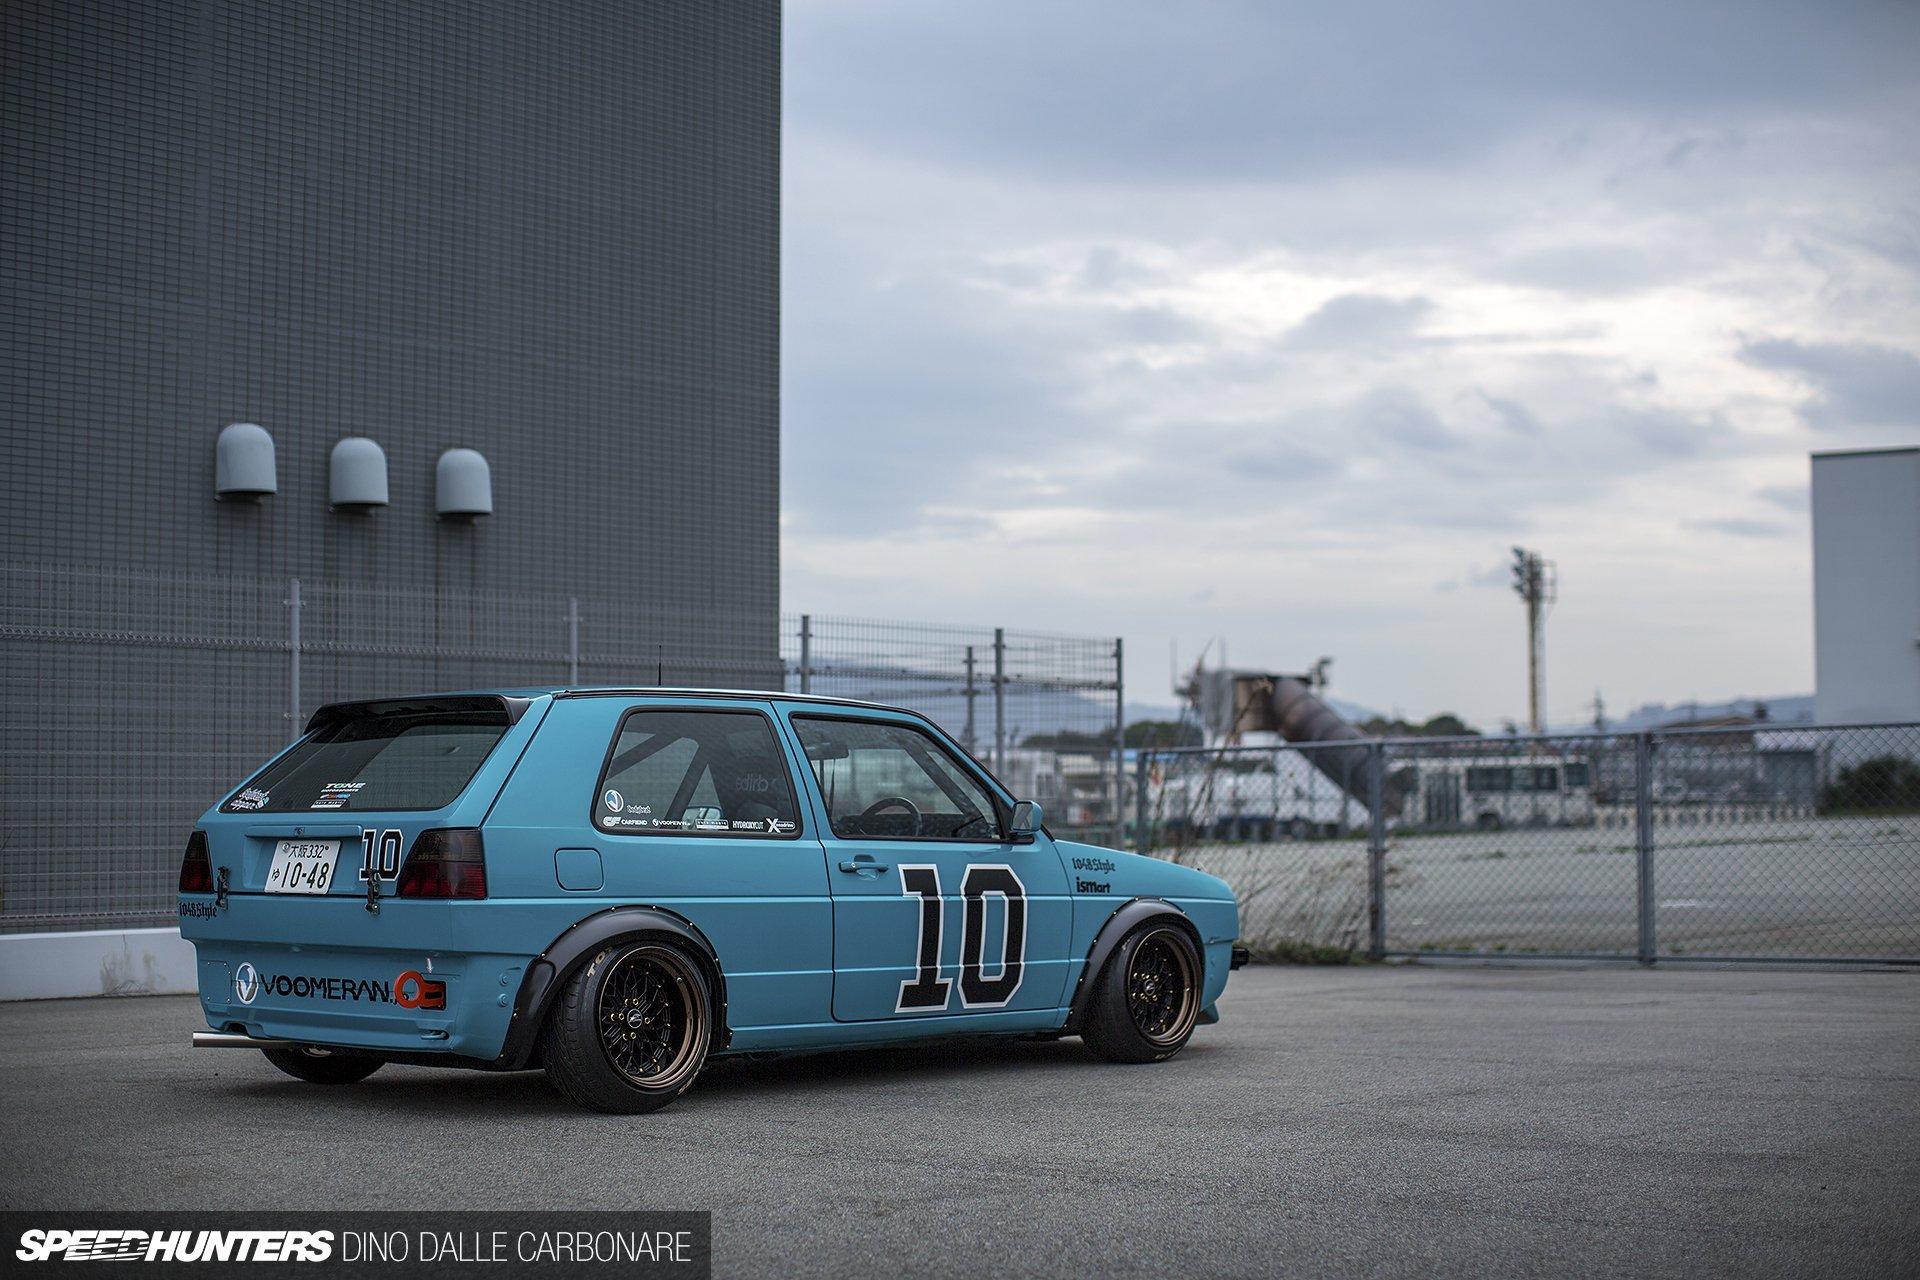 Volkswagen golf mk2 tuning race racing wallpaper for Interieur tuning auto